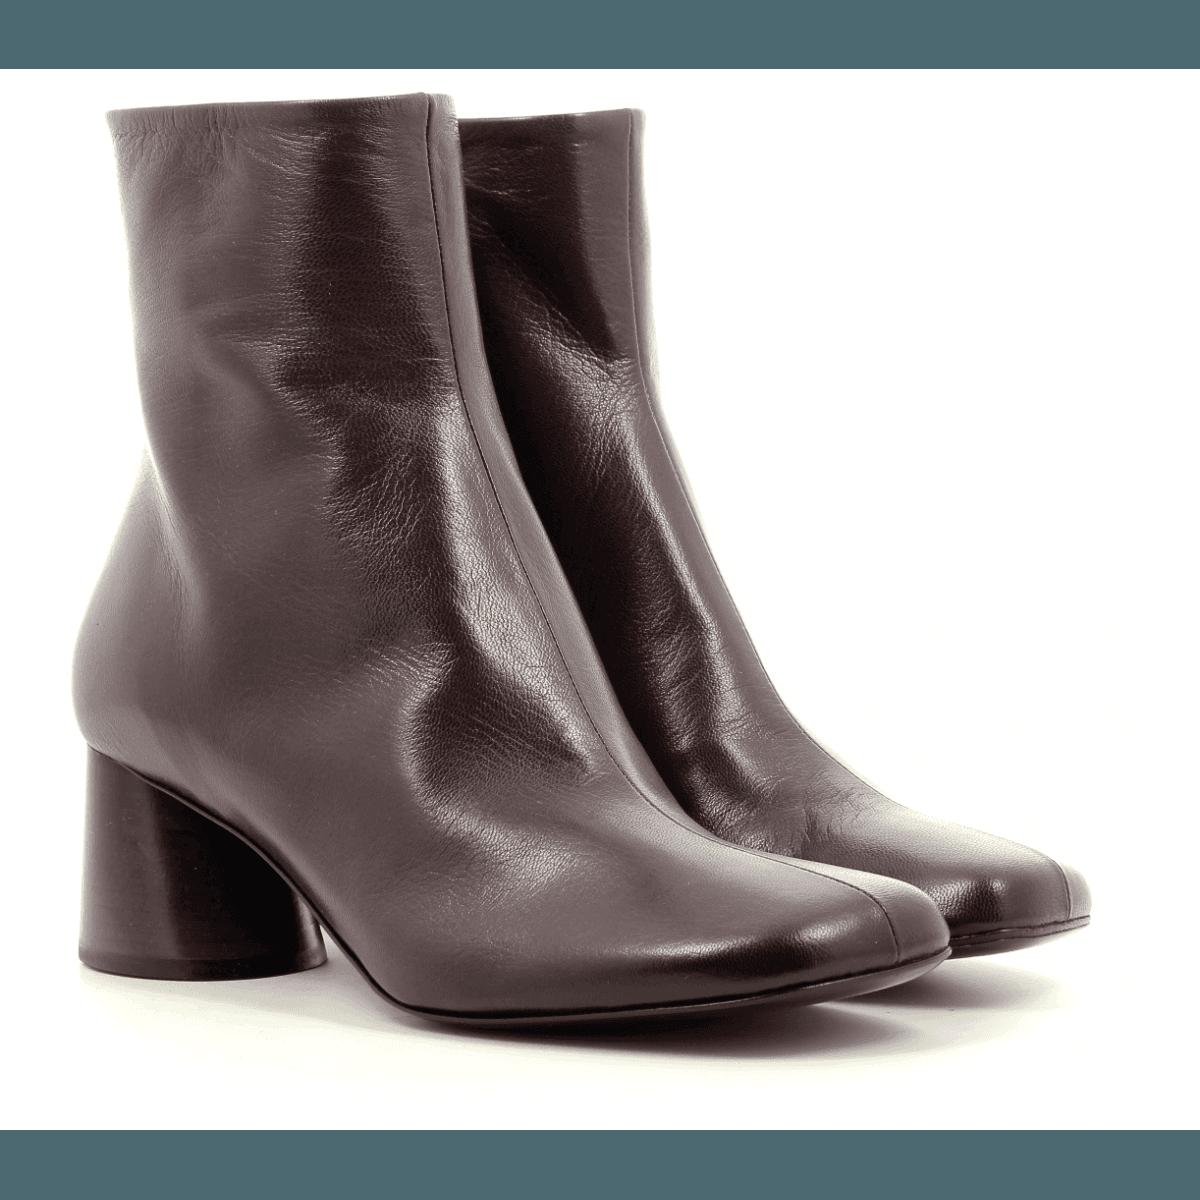 Bottines  en cuir bordeaux Halmanera - ODILE02